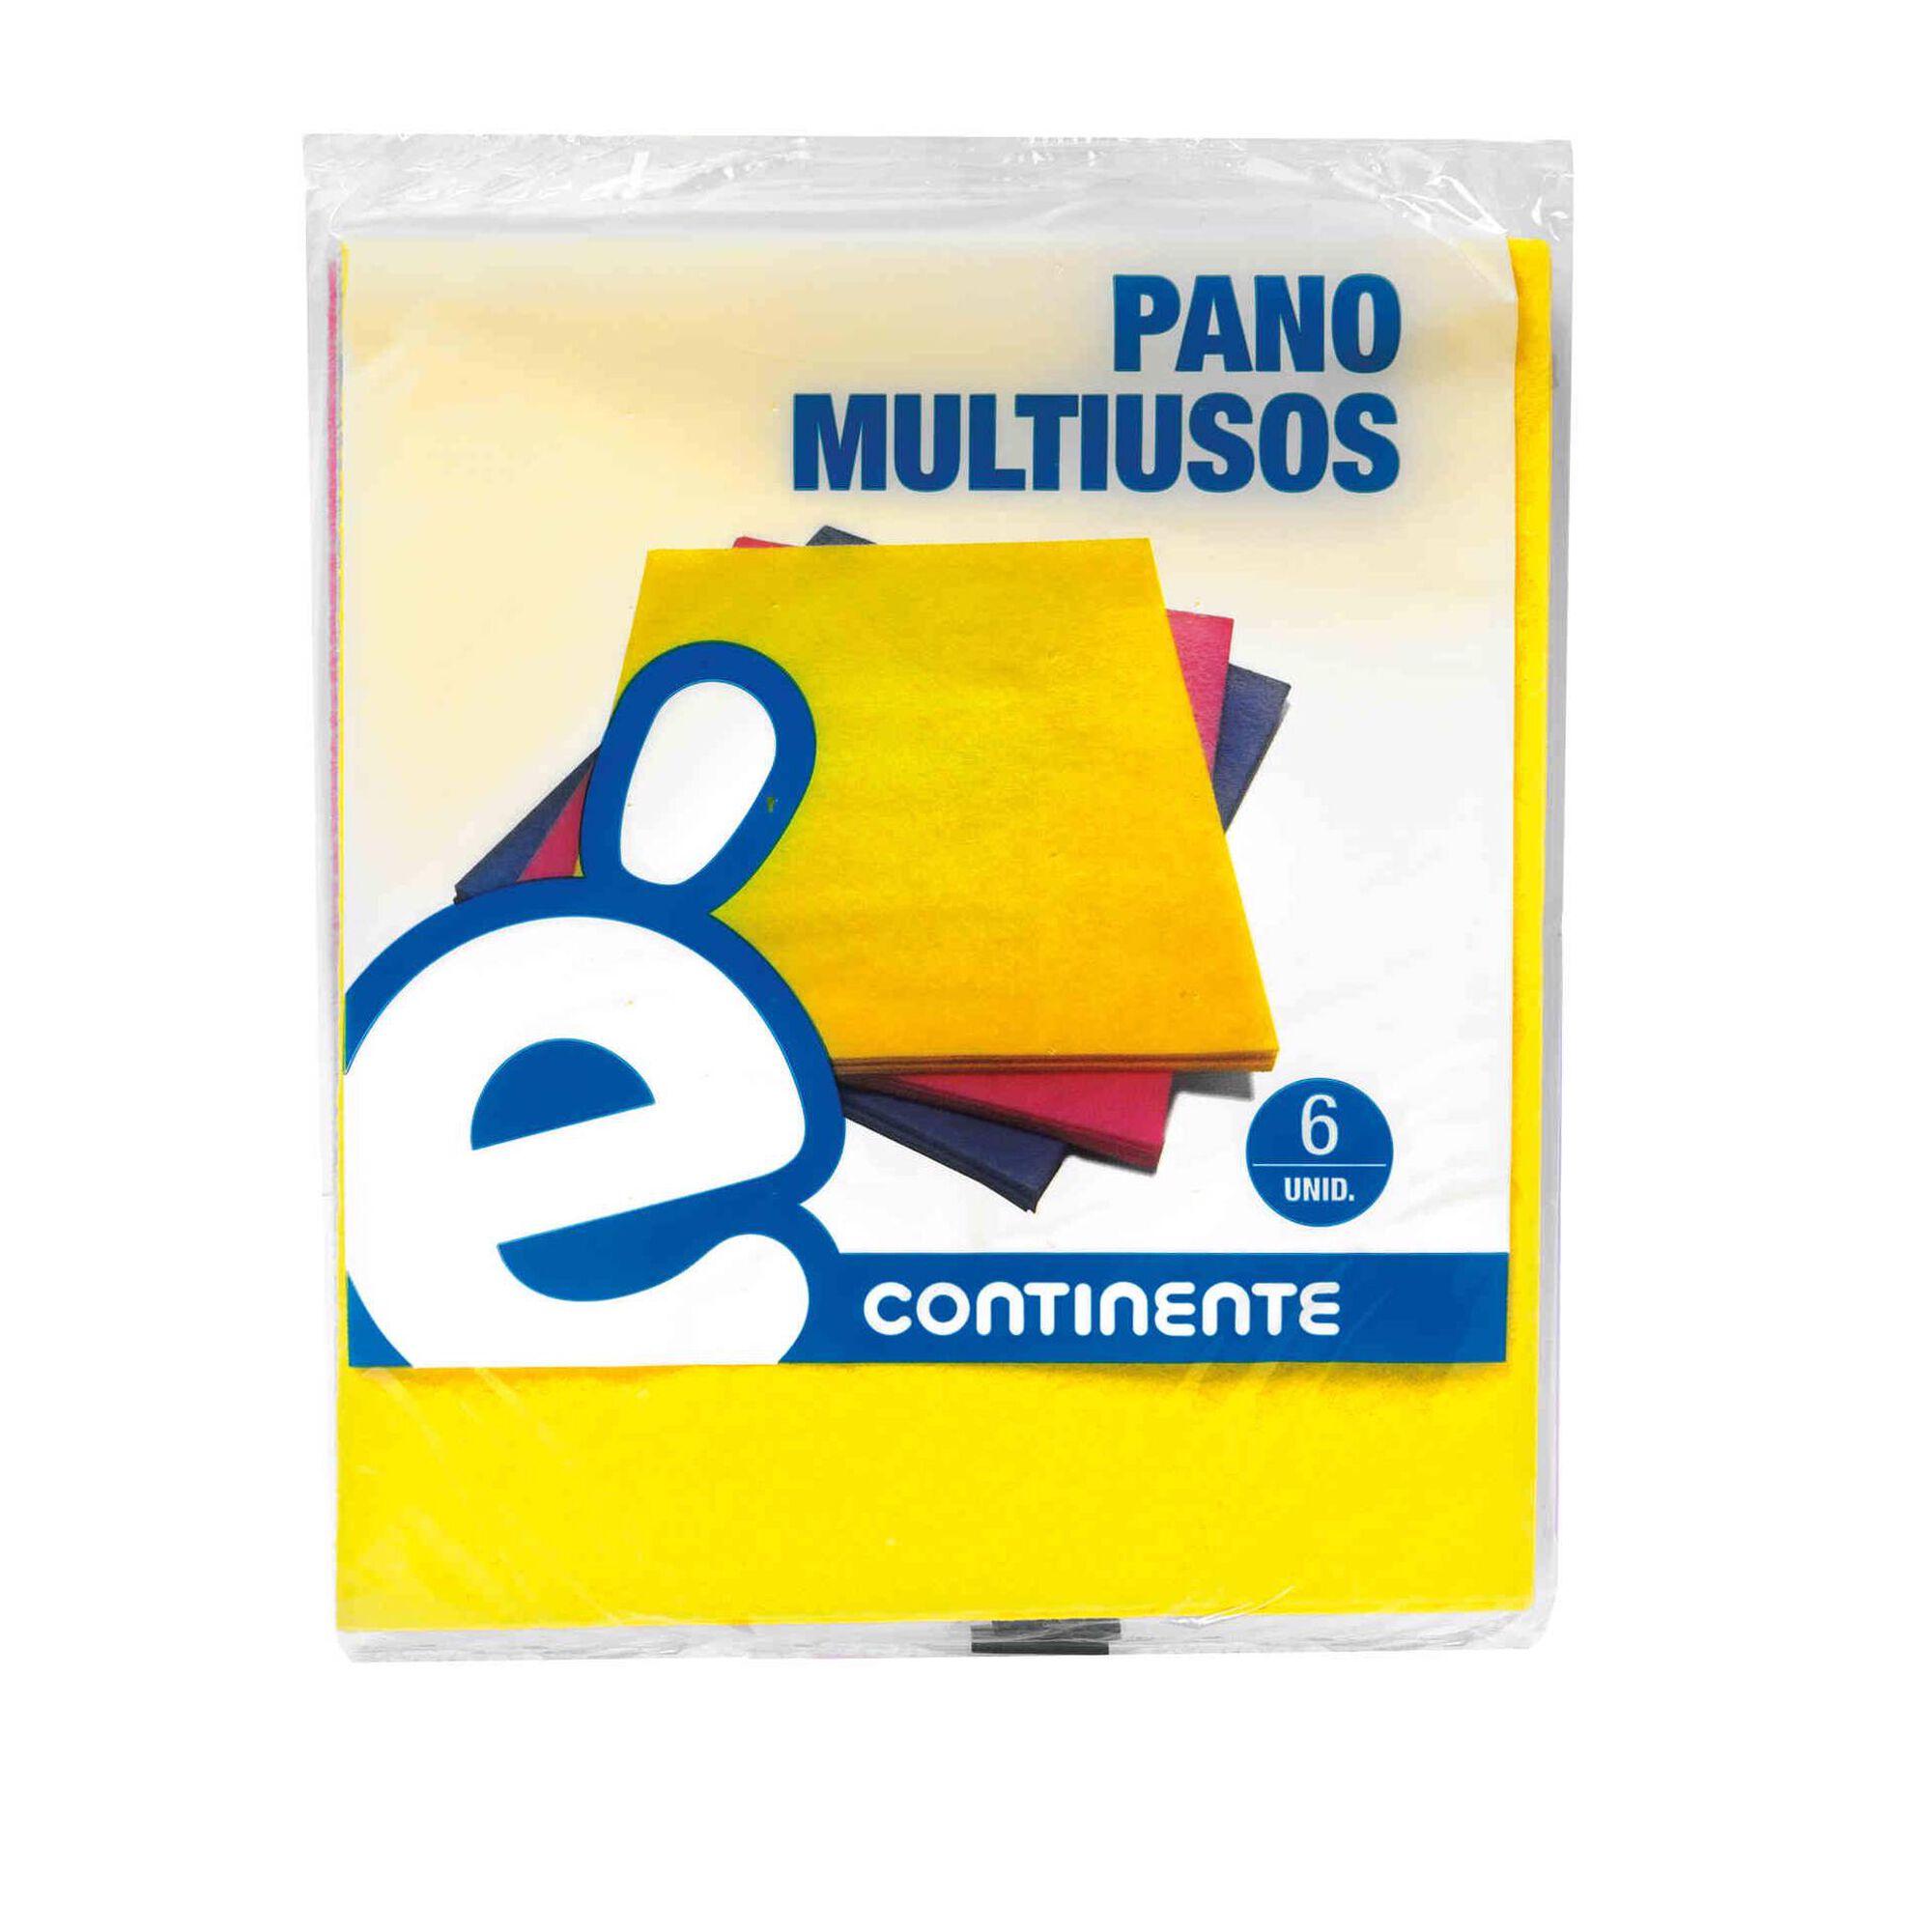 Panos Multiusos 38 x 38 cm